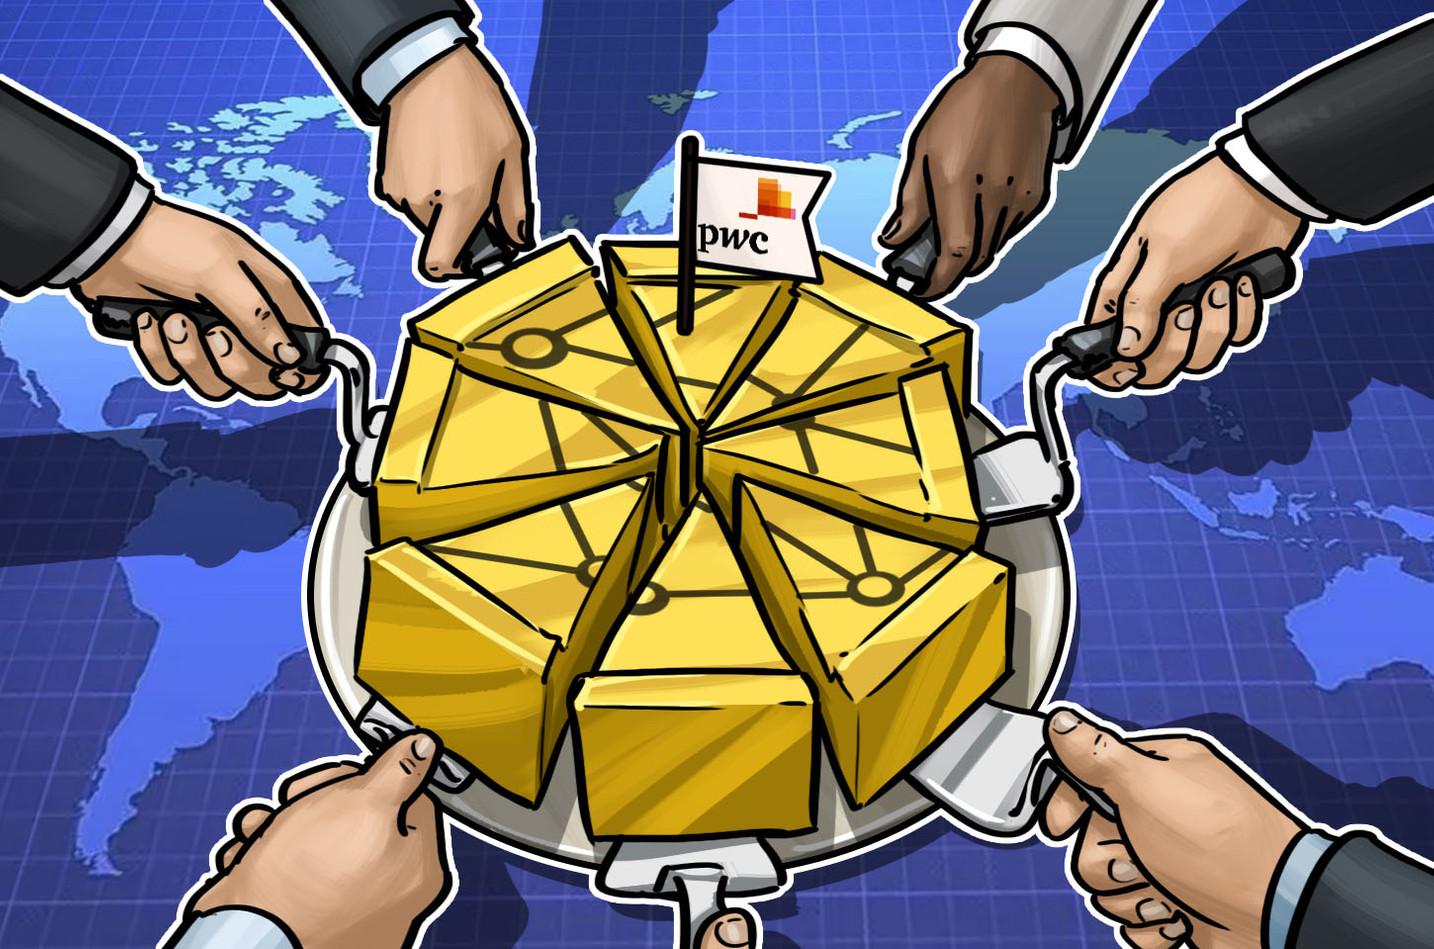 Zvanično: PwC Luksemburg počeće da prihvata bitkoin od oktobra 2019.